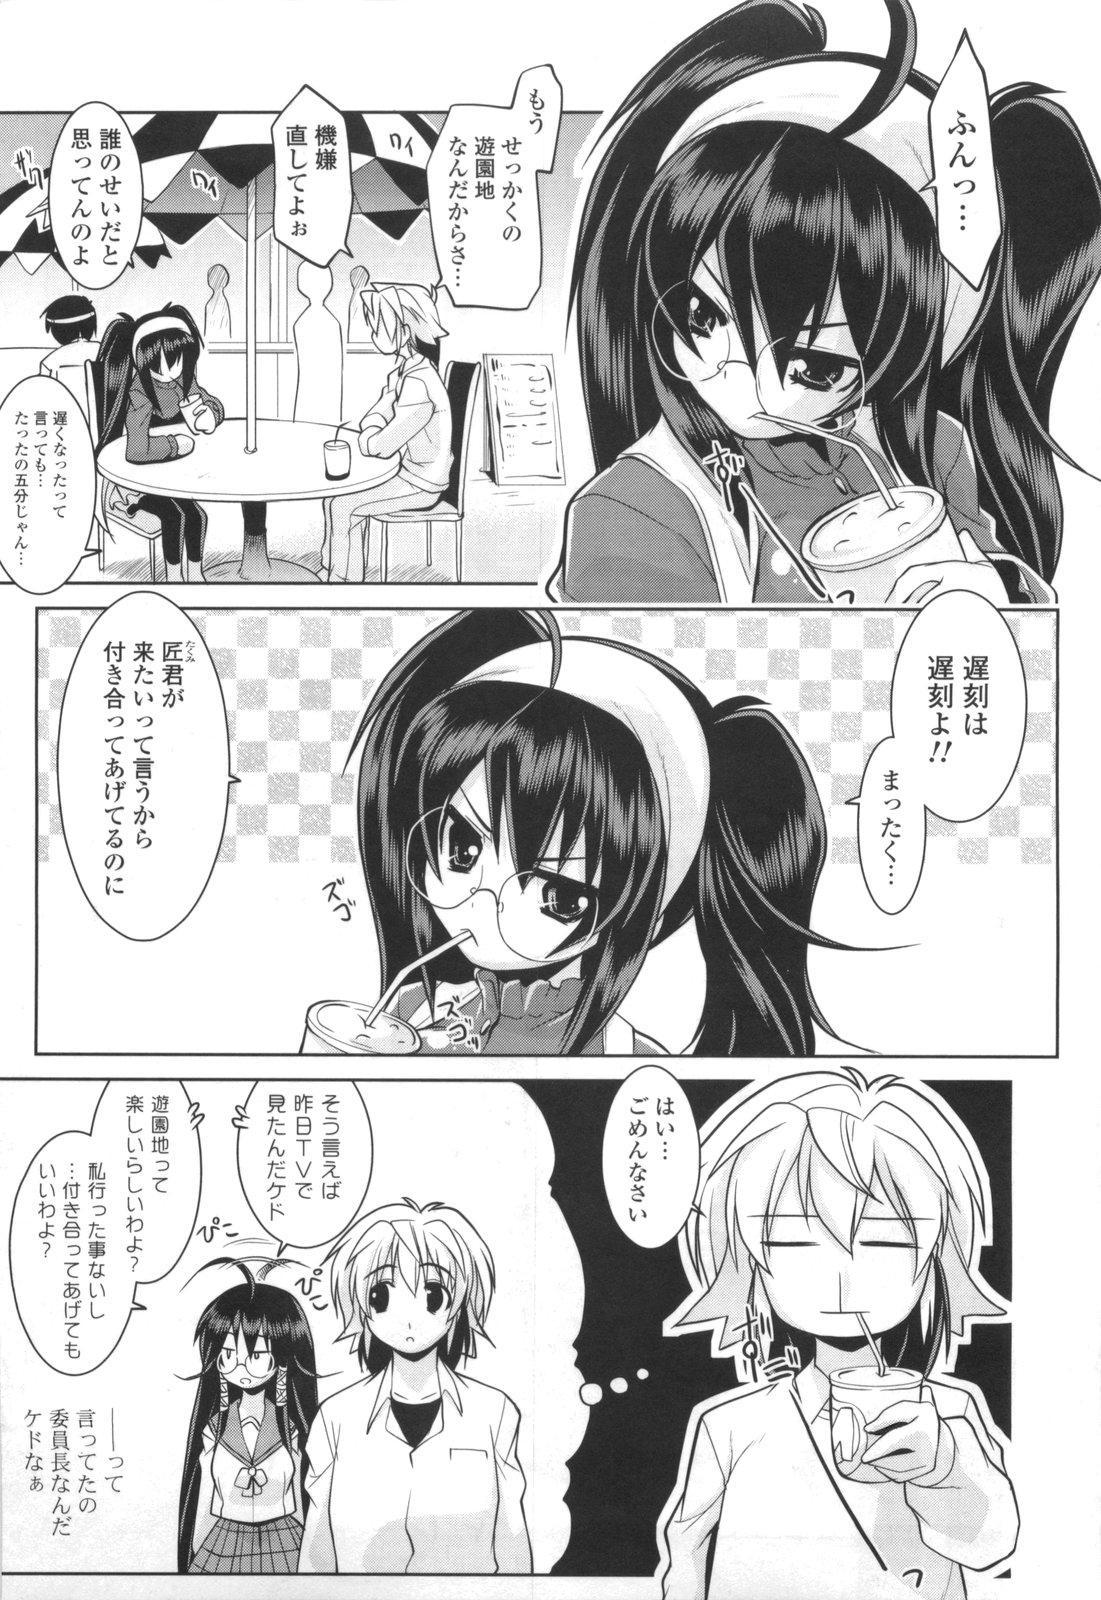 [Gyonikun] Gosyujin-sama Senyou!? Ami-sama Senyou 118